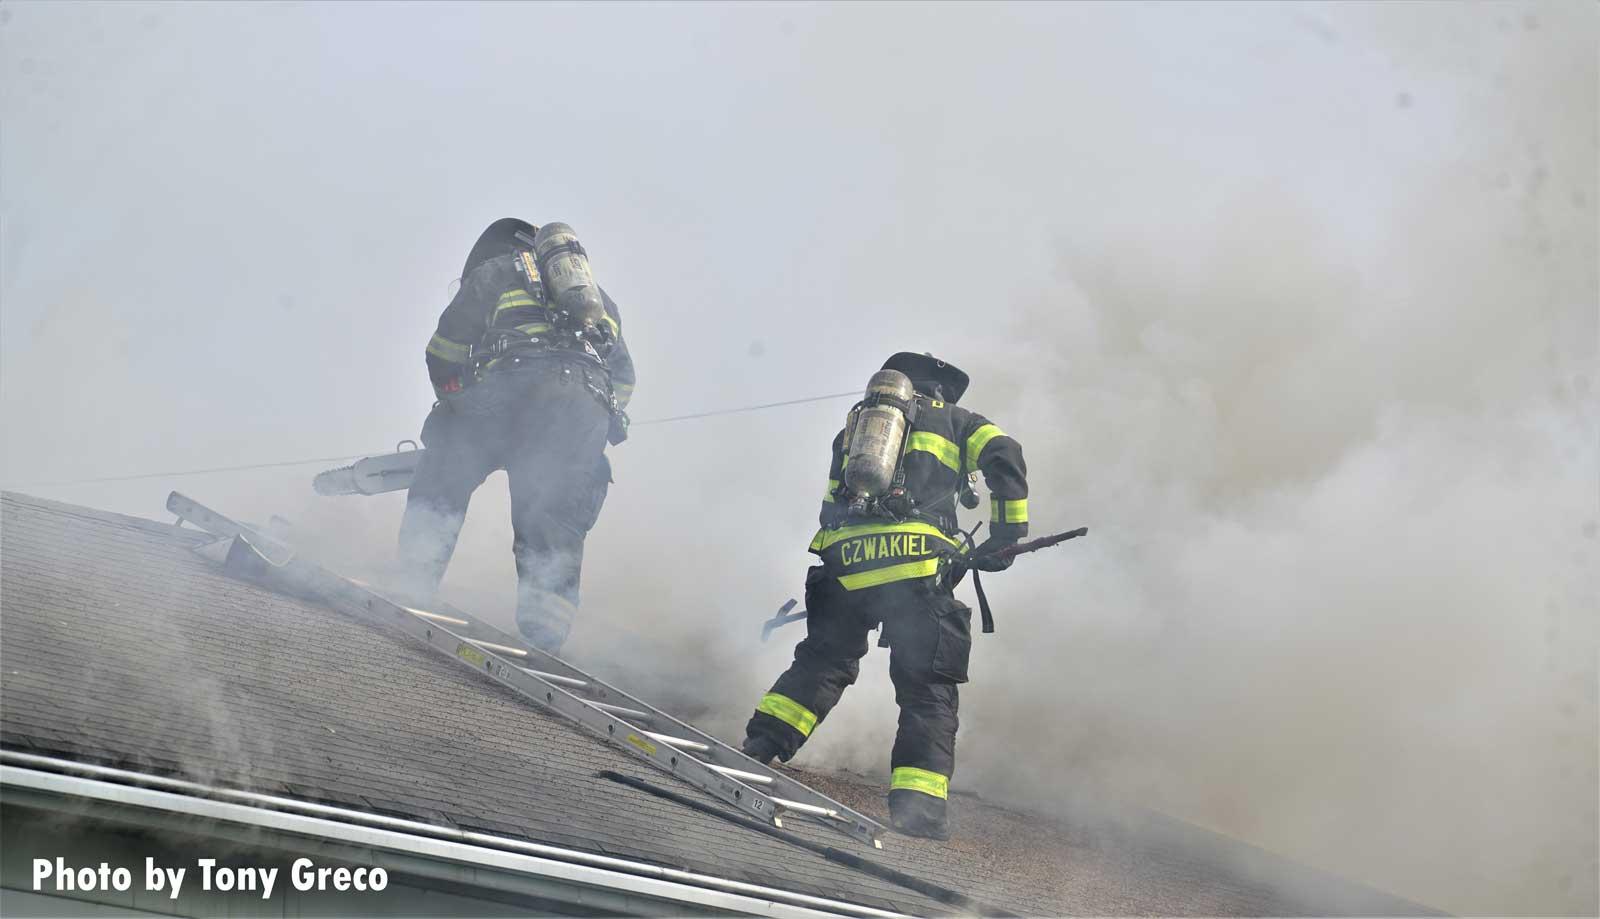 Fierfighters work on vertical ventilation